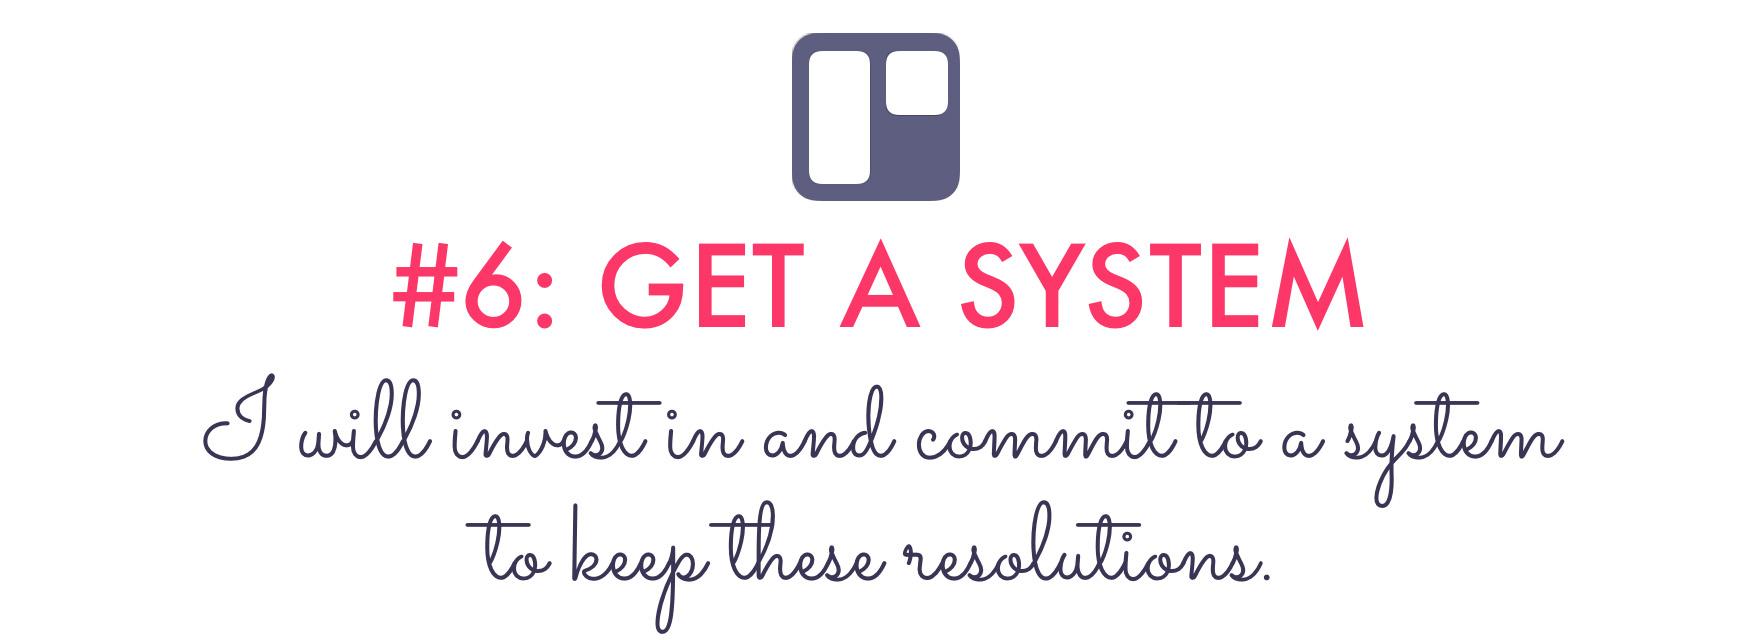 TEFL-Resolutions-6-Get-A-System.jpg